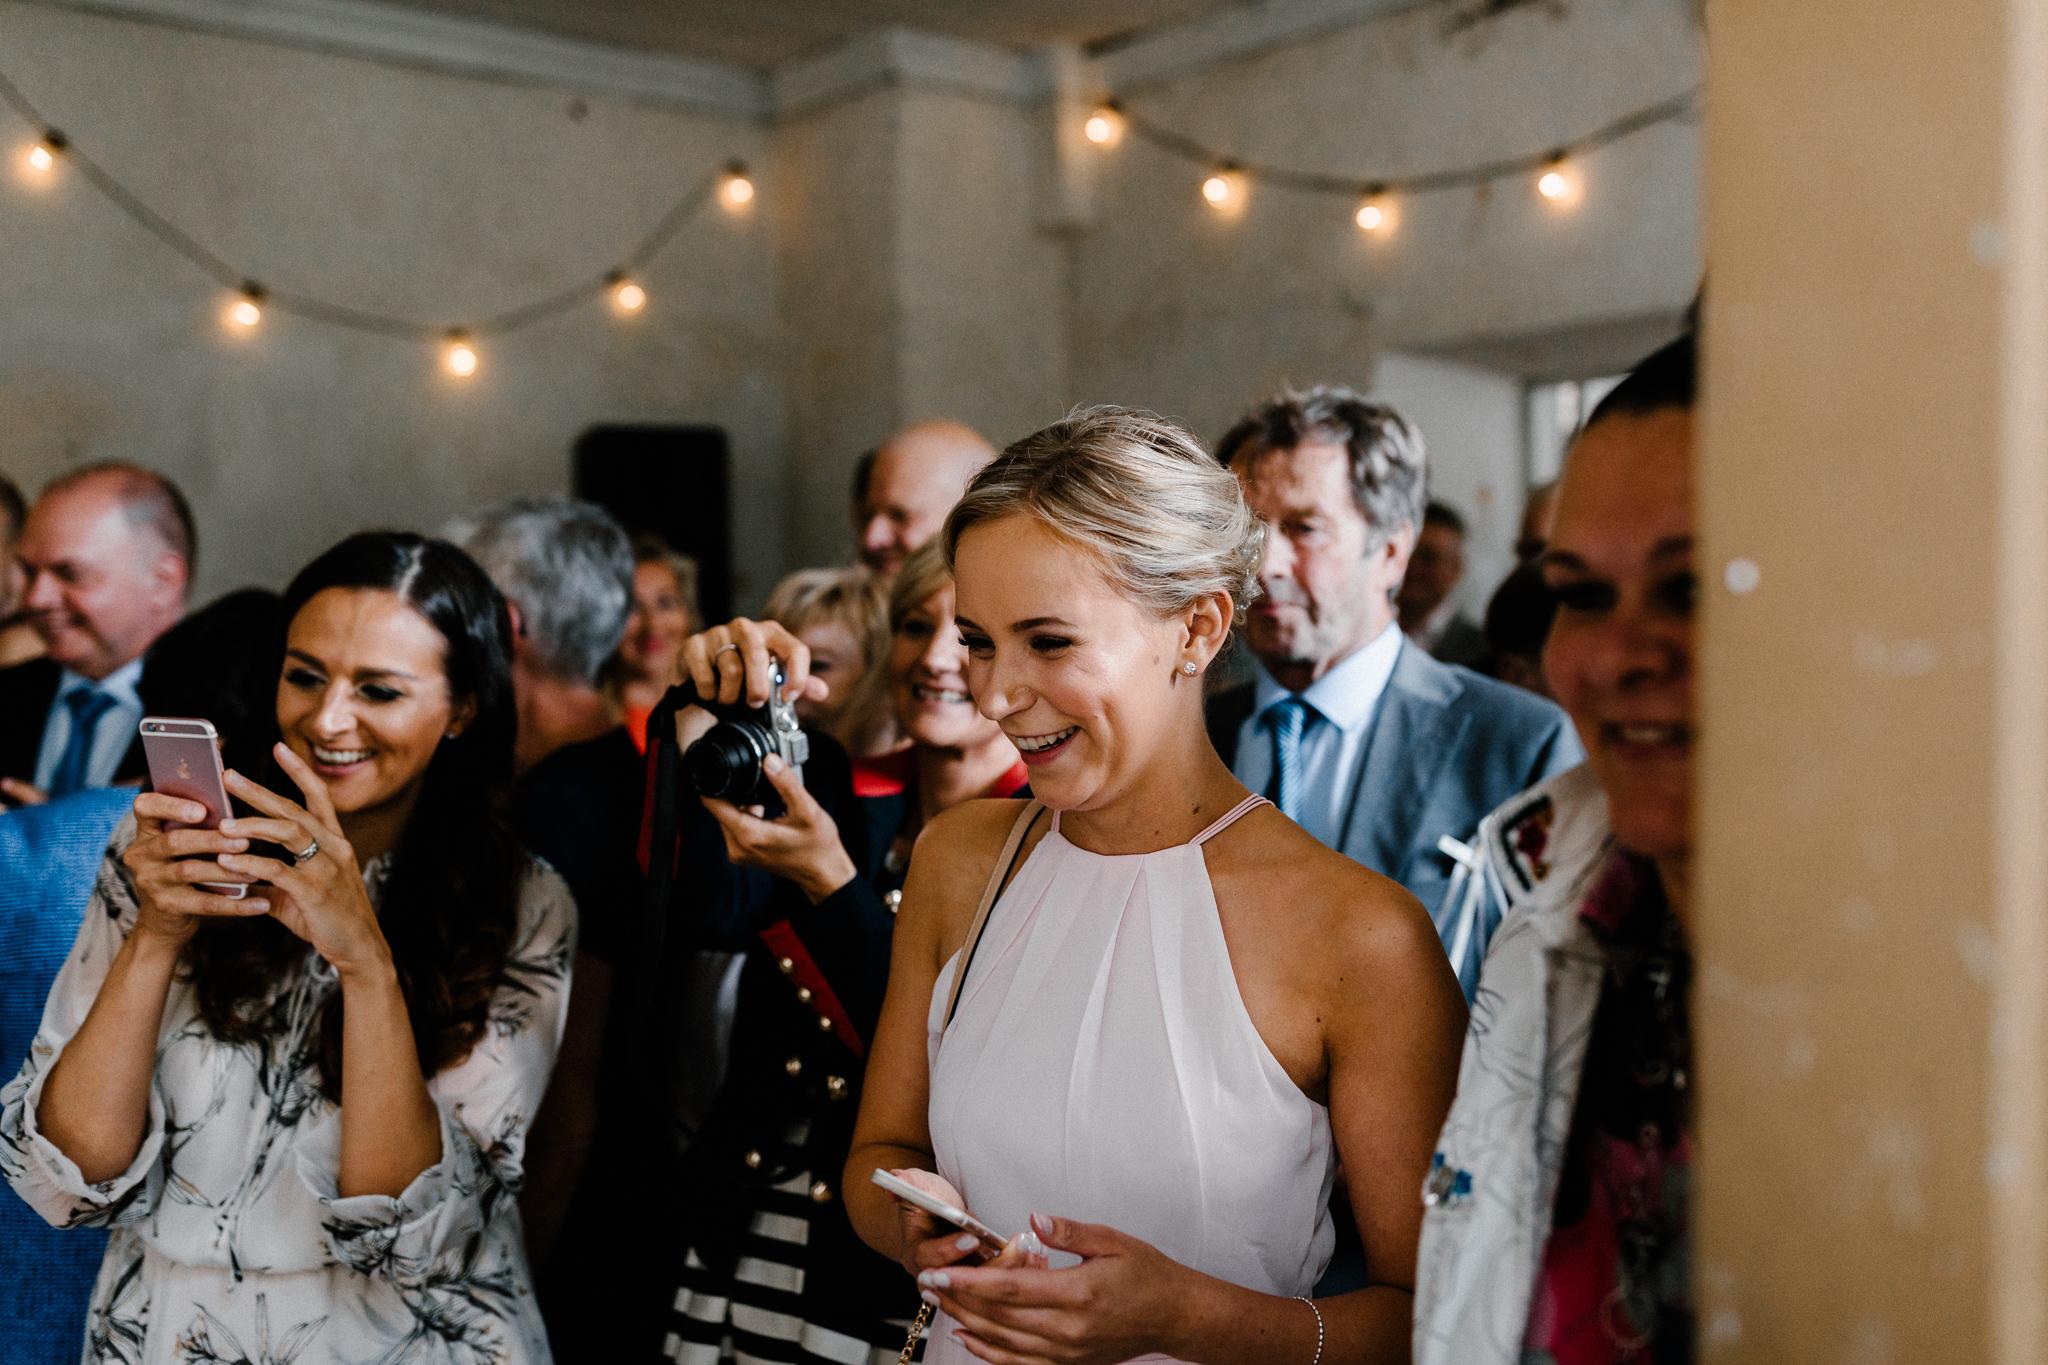 Essi + Ville   Oitbacka Gården   by Patrick Karkkolainen Wedding Photography-254.jpg